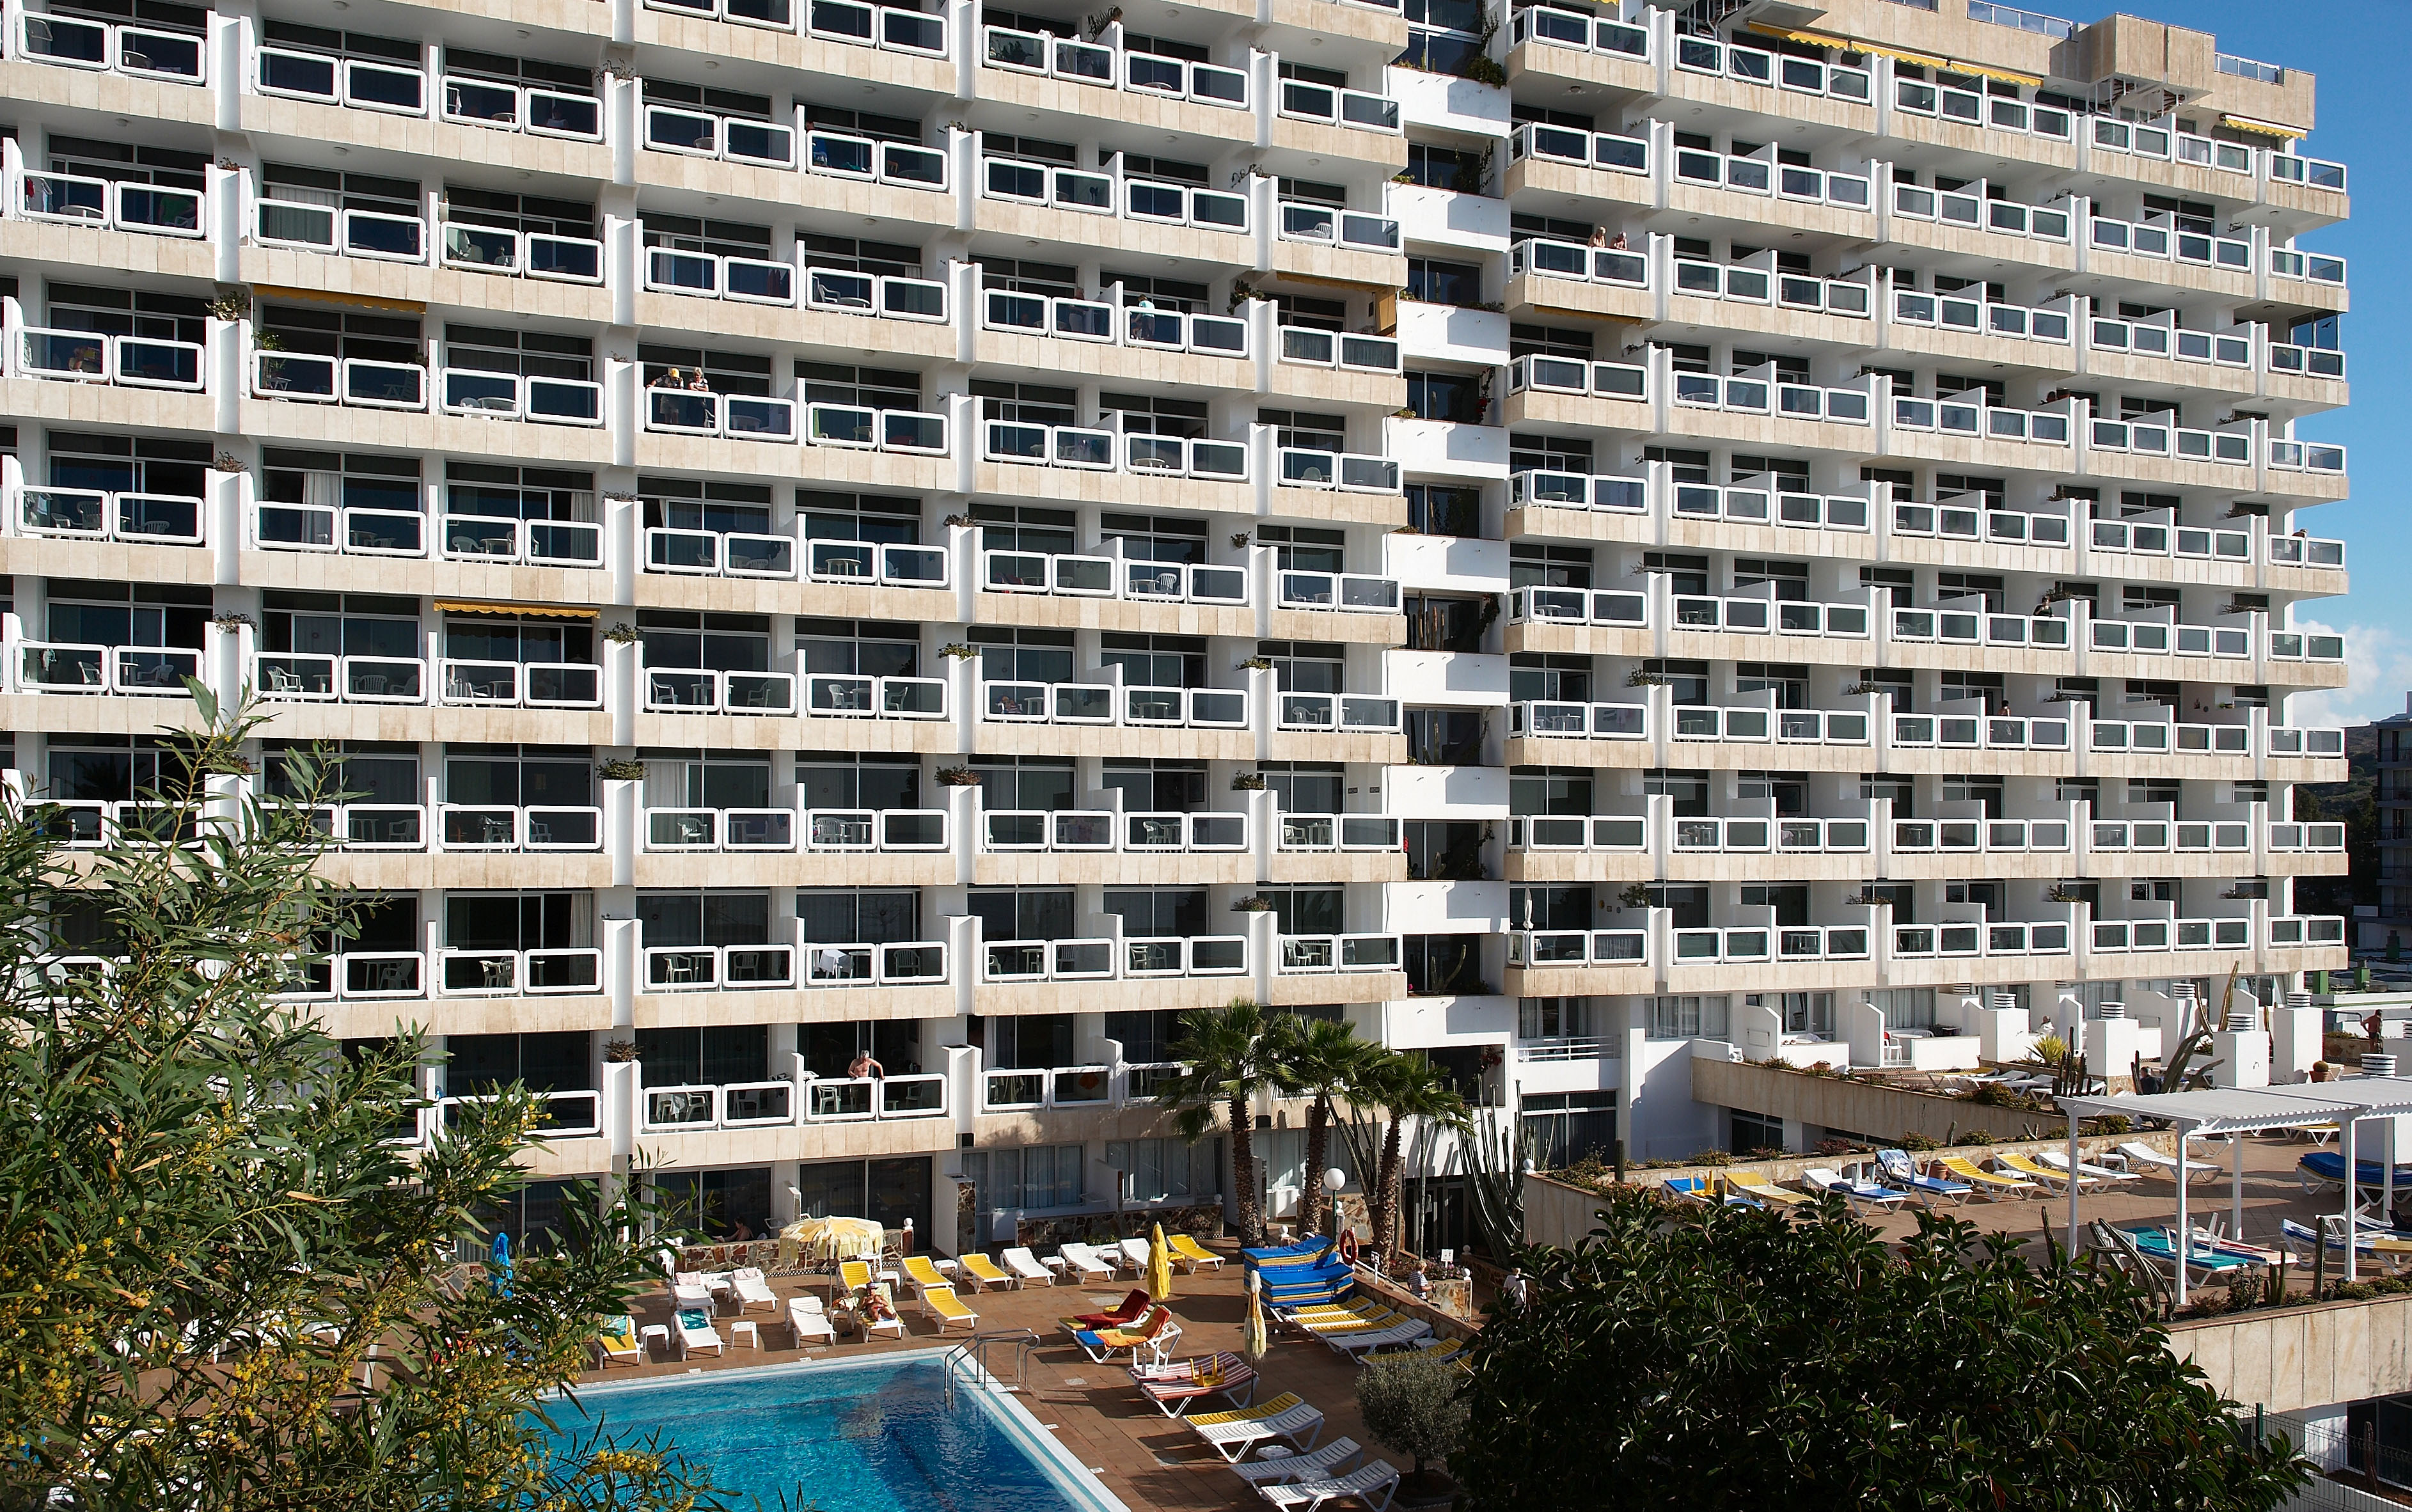 Gran Canaria Hotel Europalace Playa Del Ingles